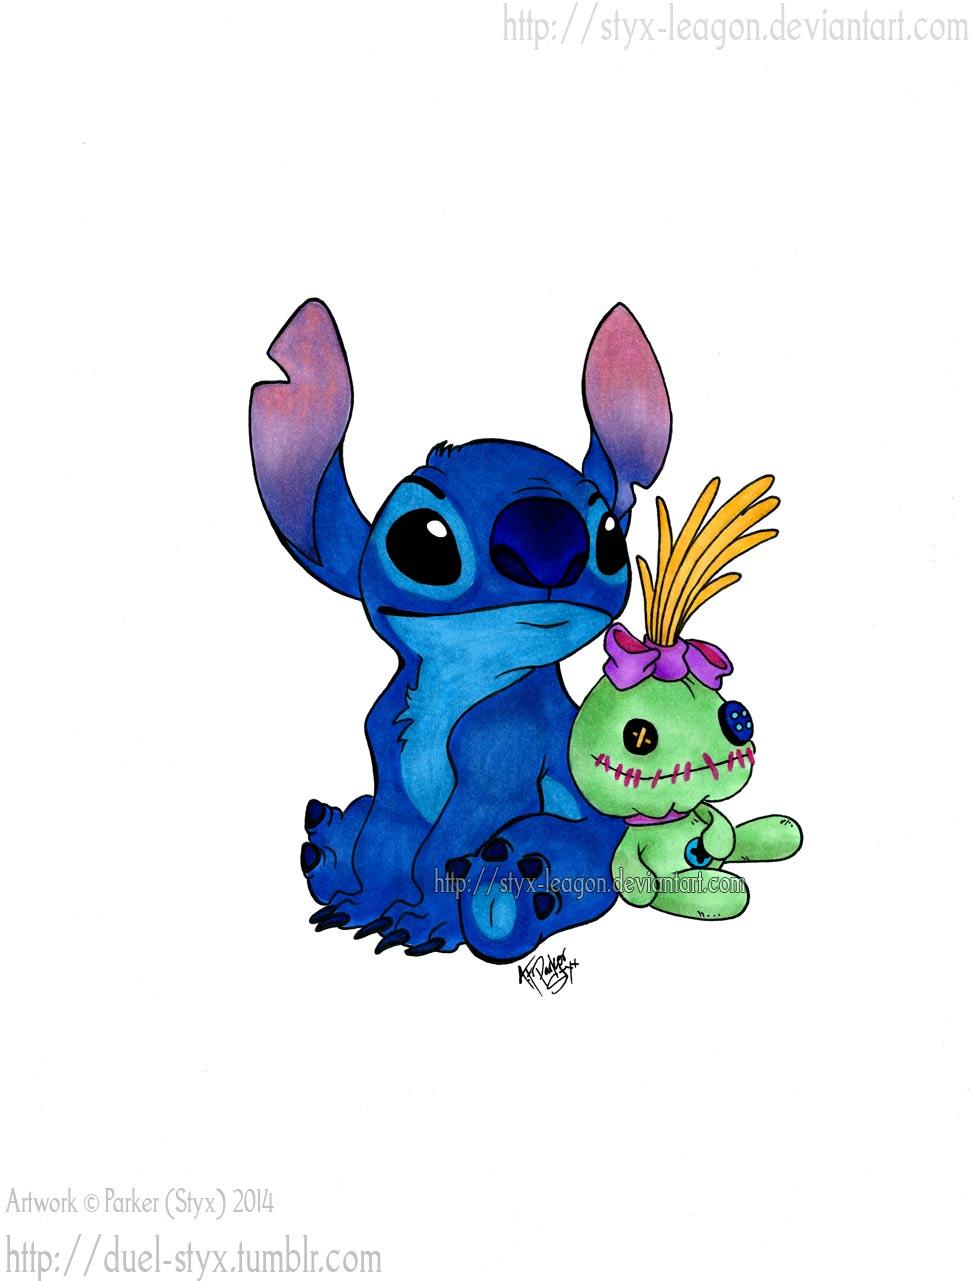 Stitch And Scrump By Styx Leagon On Deviantart